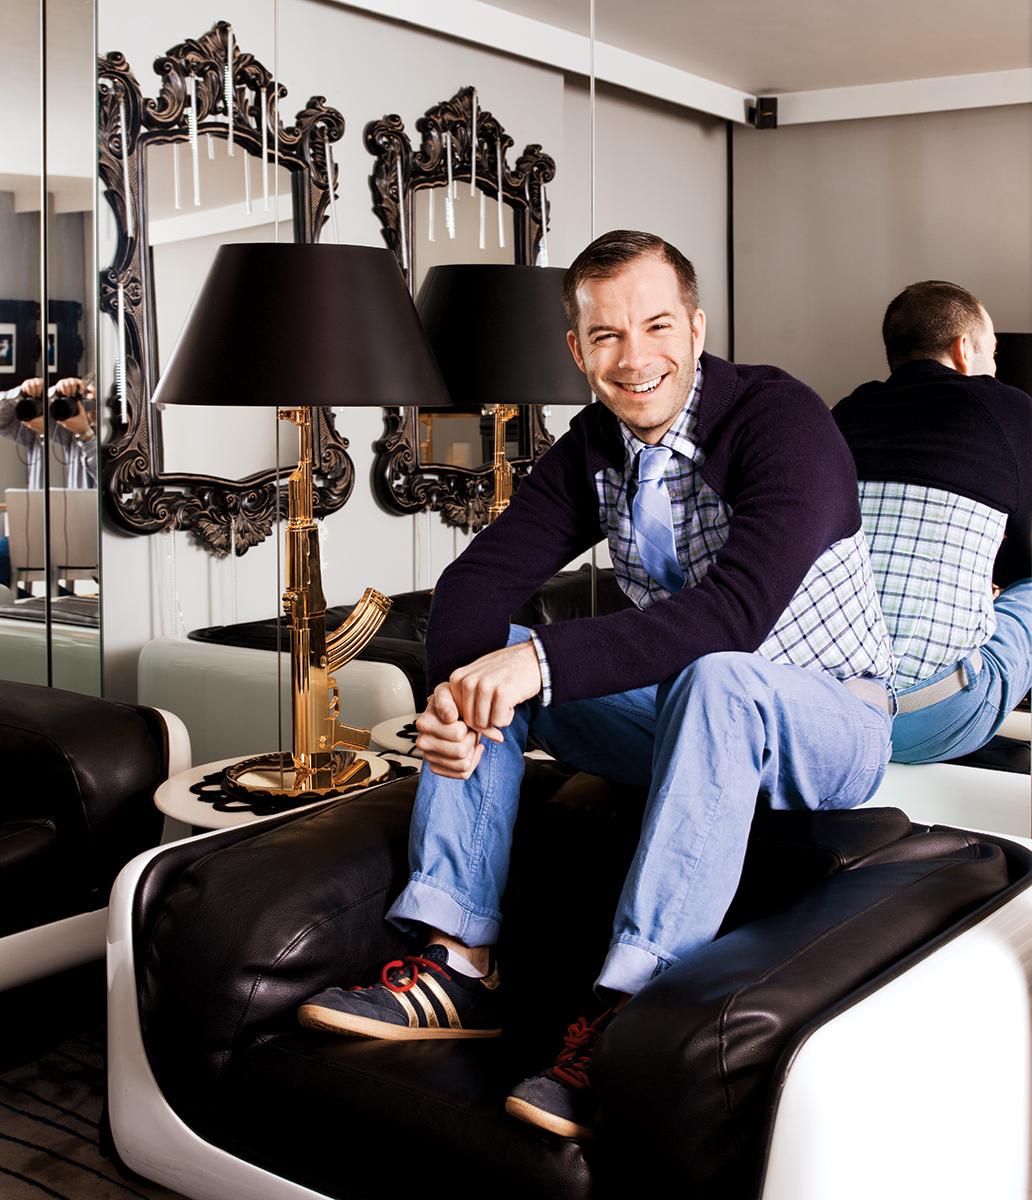 Designer Marlon Gobel